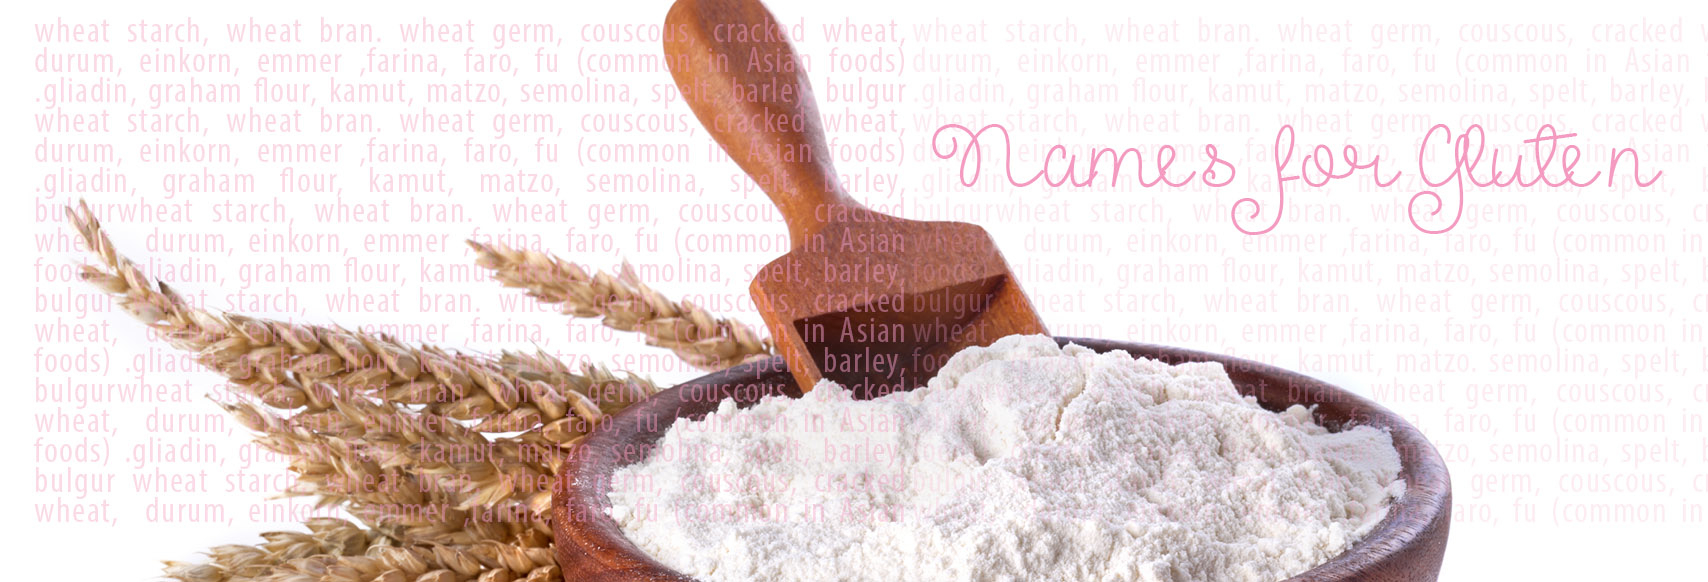 gluten-names-celiac-mama